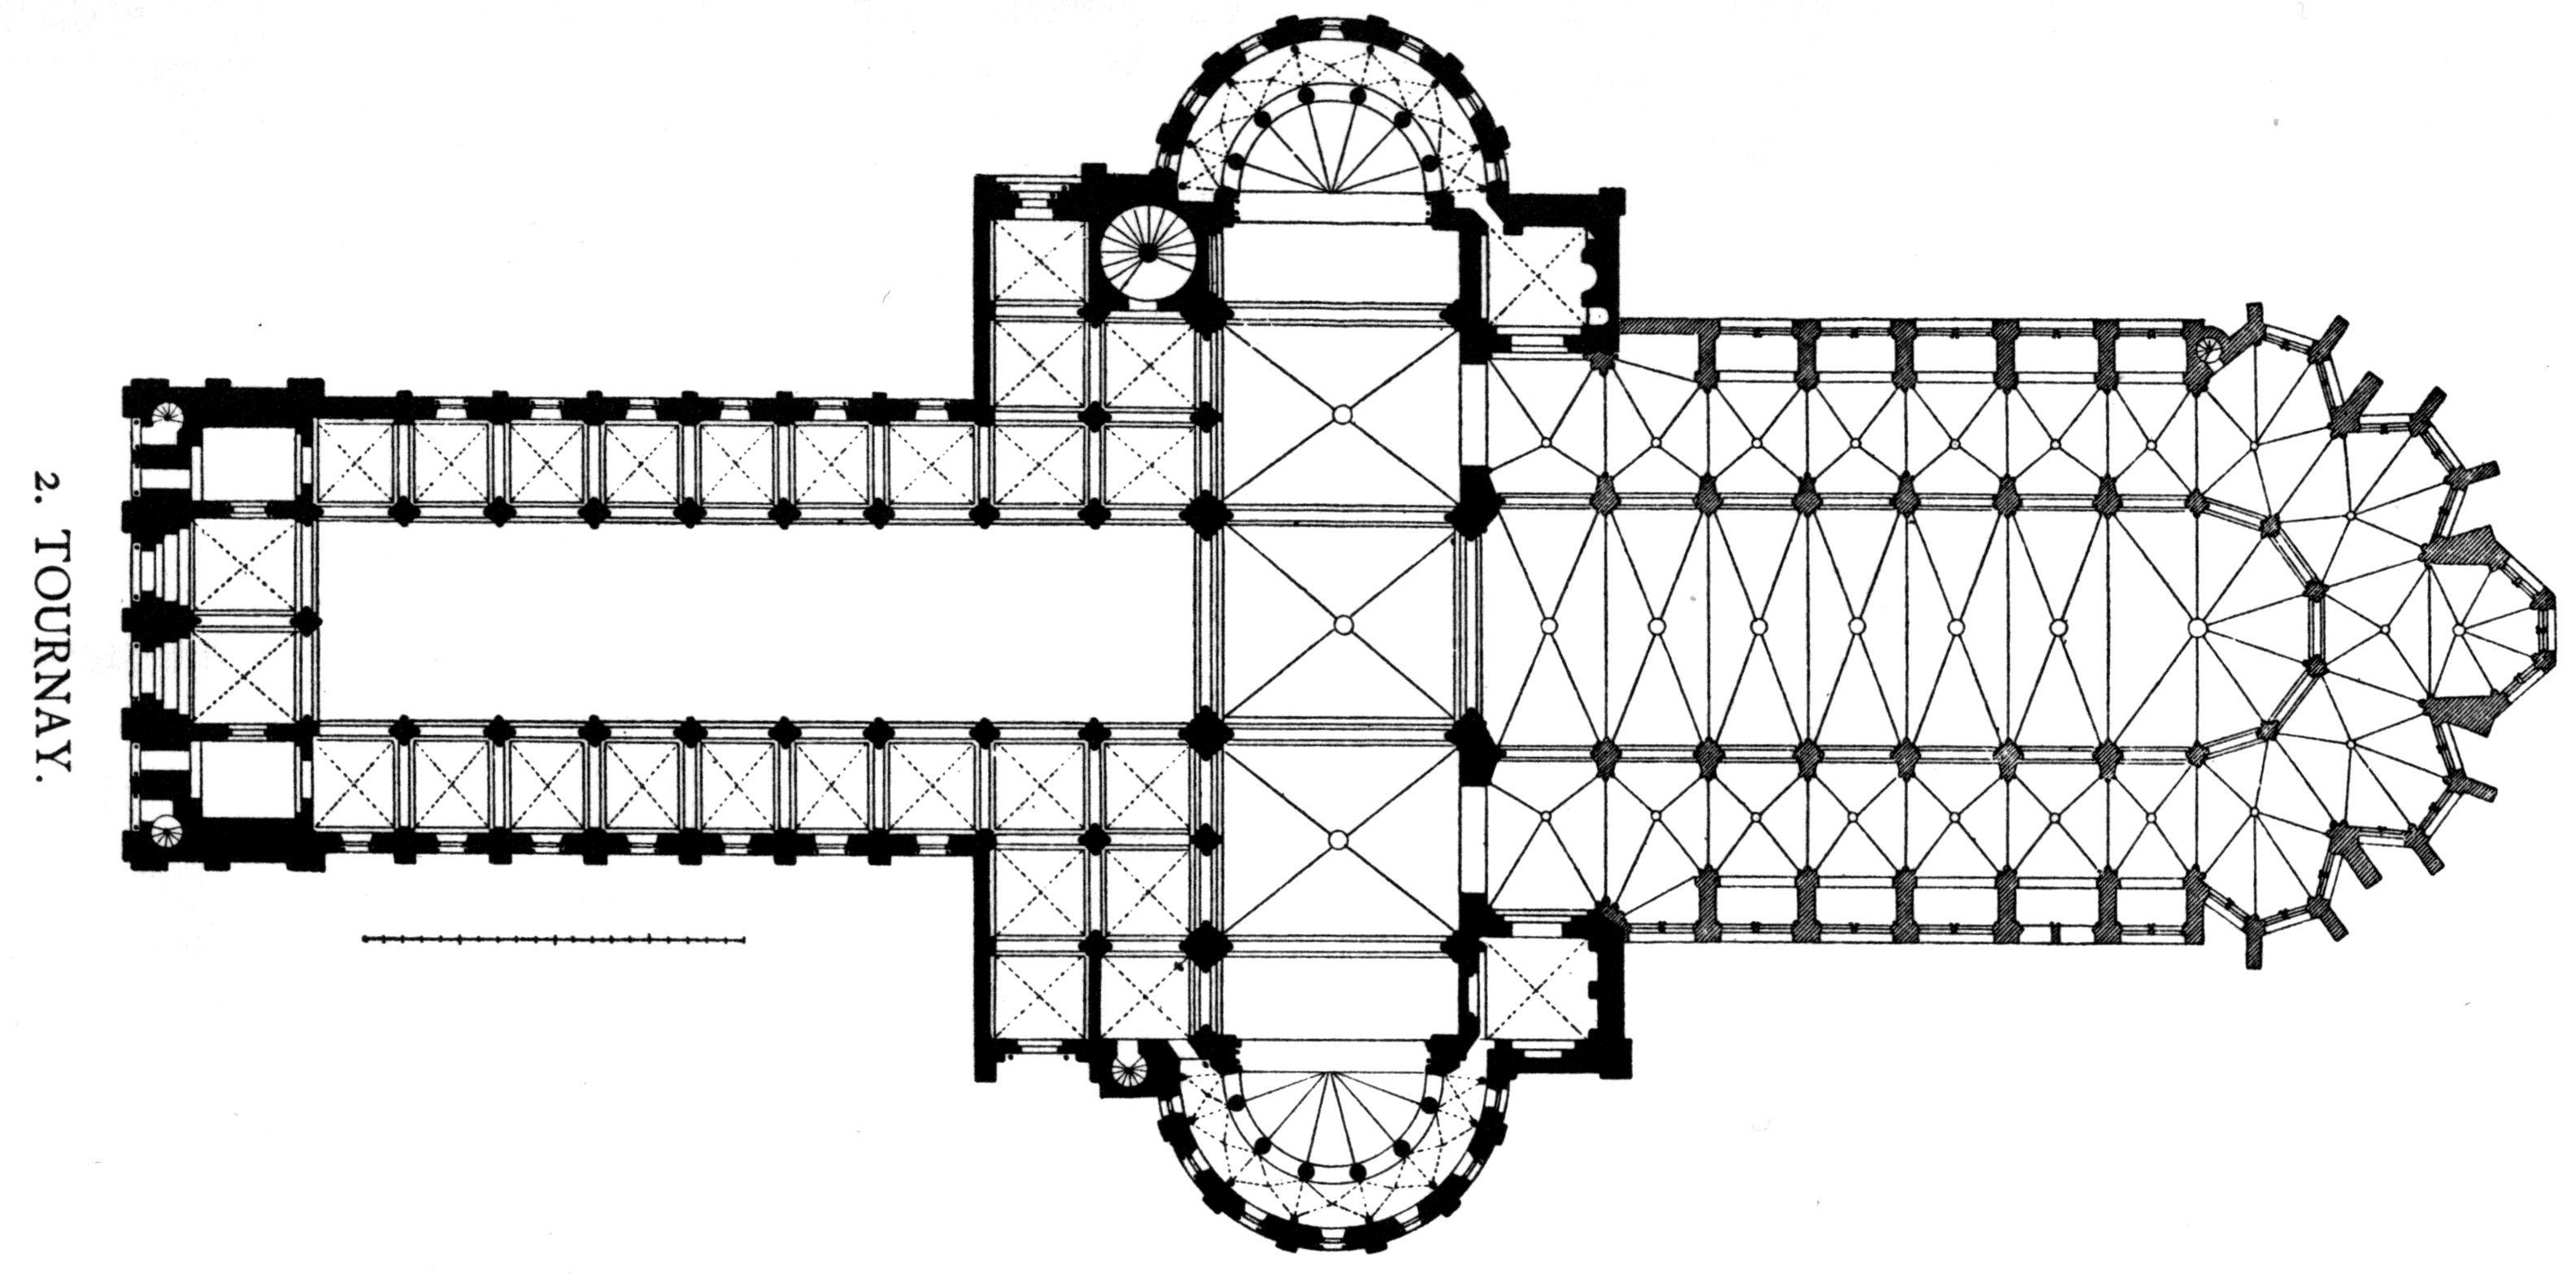 File Dehio 83 Tournai Floor Plan Ver